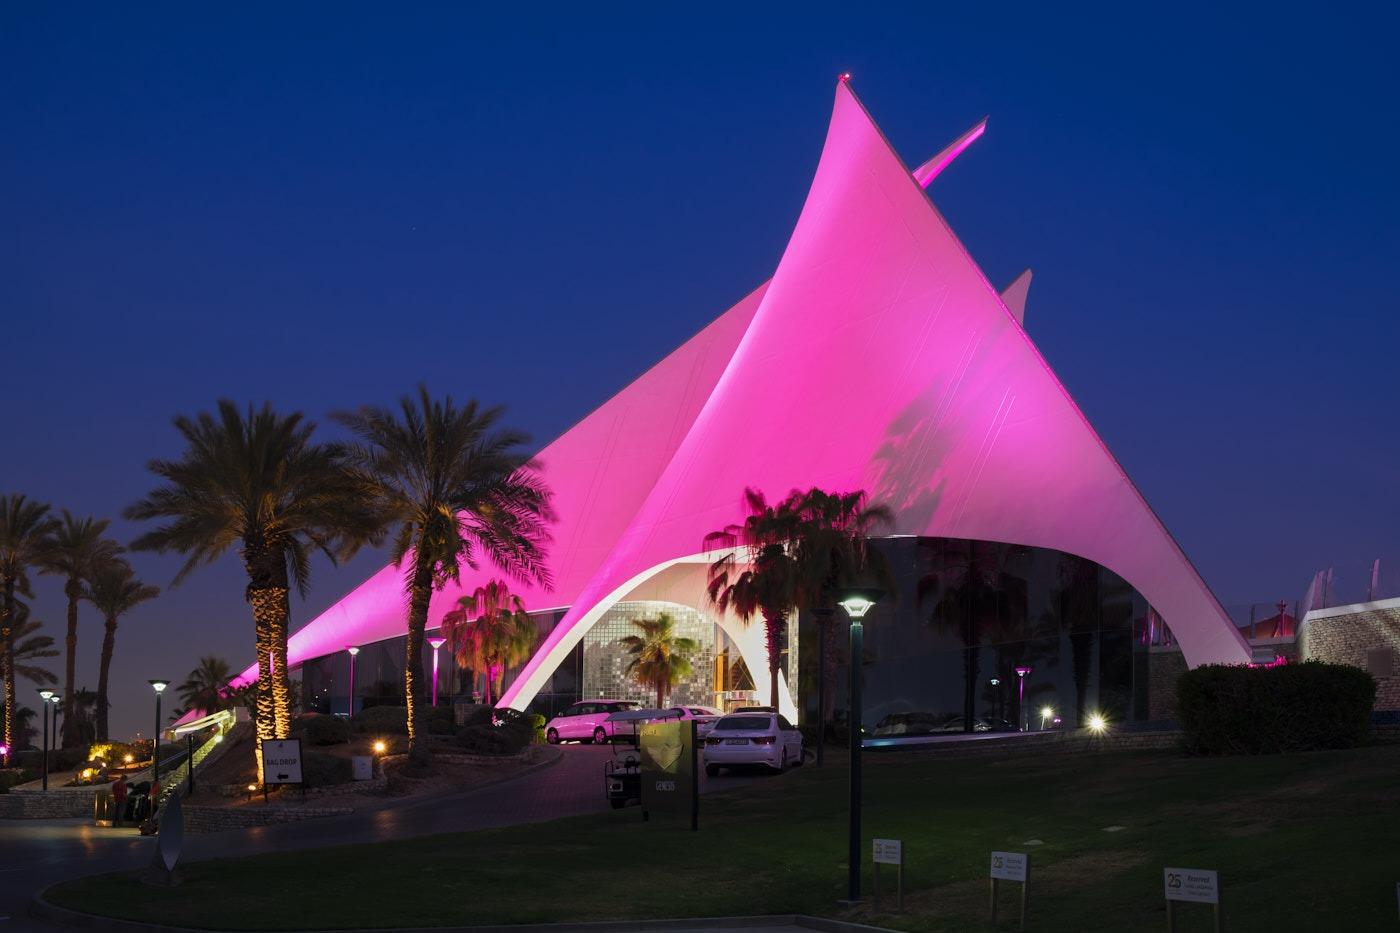 Image: Dubai Creek Golf Club